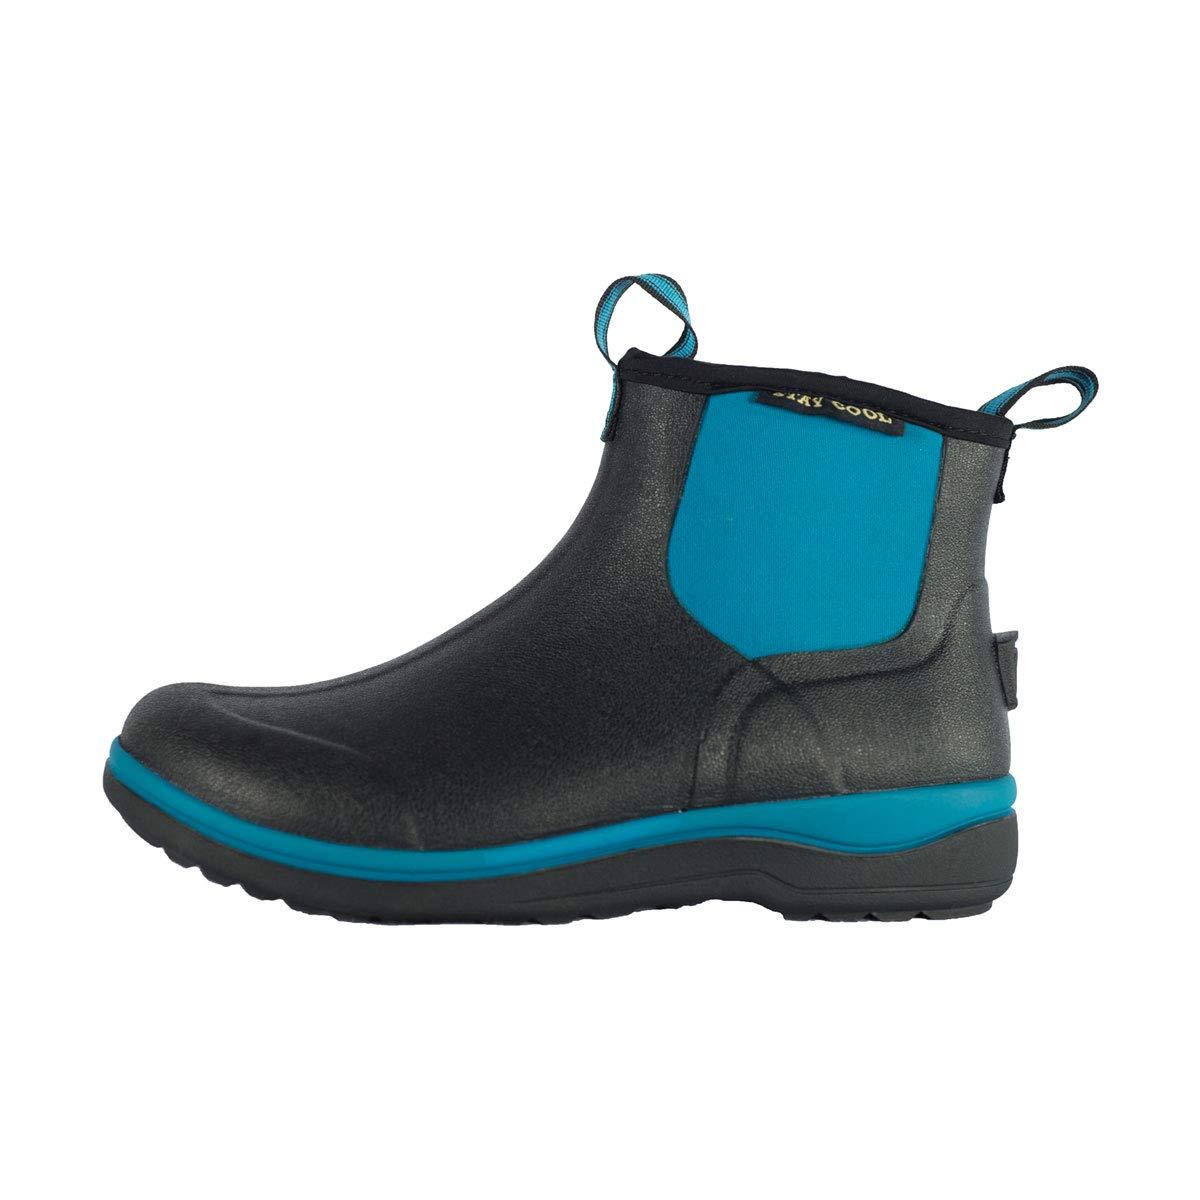 [Noble Outfitters] (ノーブルアウトフィッターズ) レディース Muds Stay クール 6 ブーツ 婦人靴 長靴 乗馬 レインブーツ 女性用 B01H4G44E0 9|Deep Turquoise Deep Turquoise 9